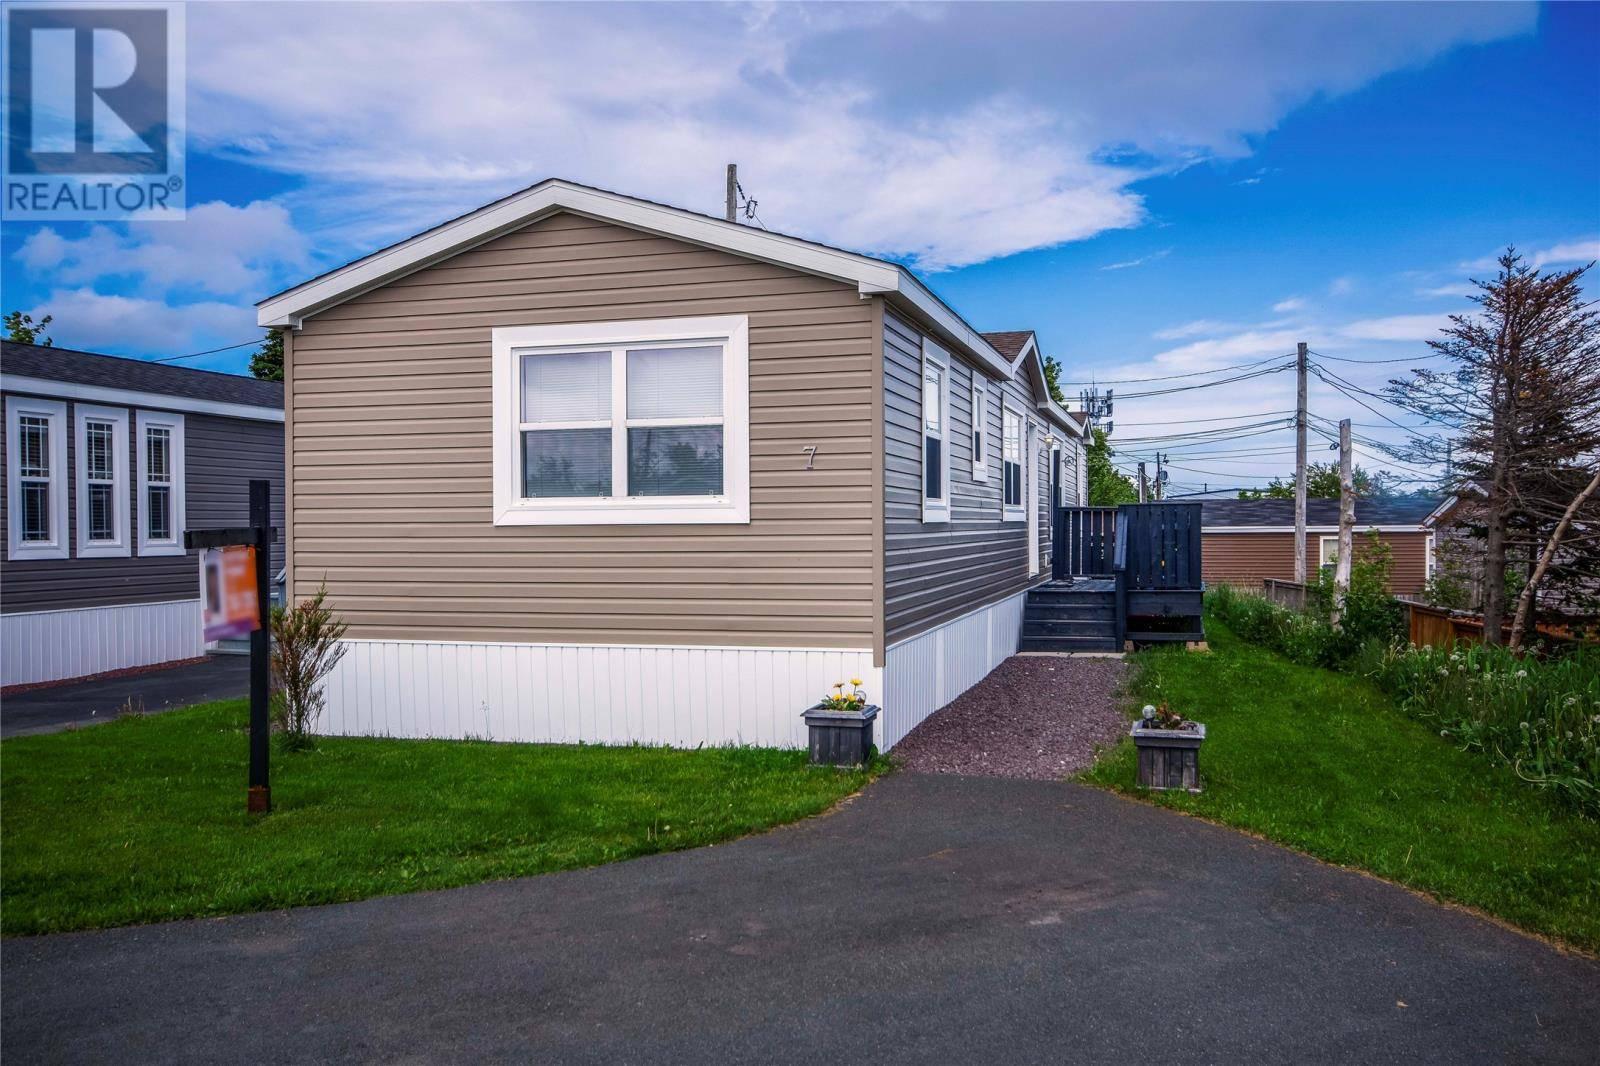 House for sale at 7 Rhaye Pl St. John's Newfoundland - MLS: 1209627